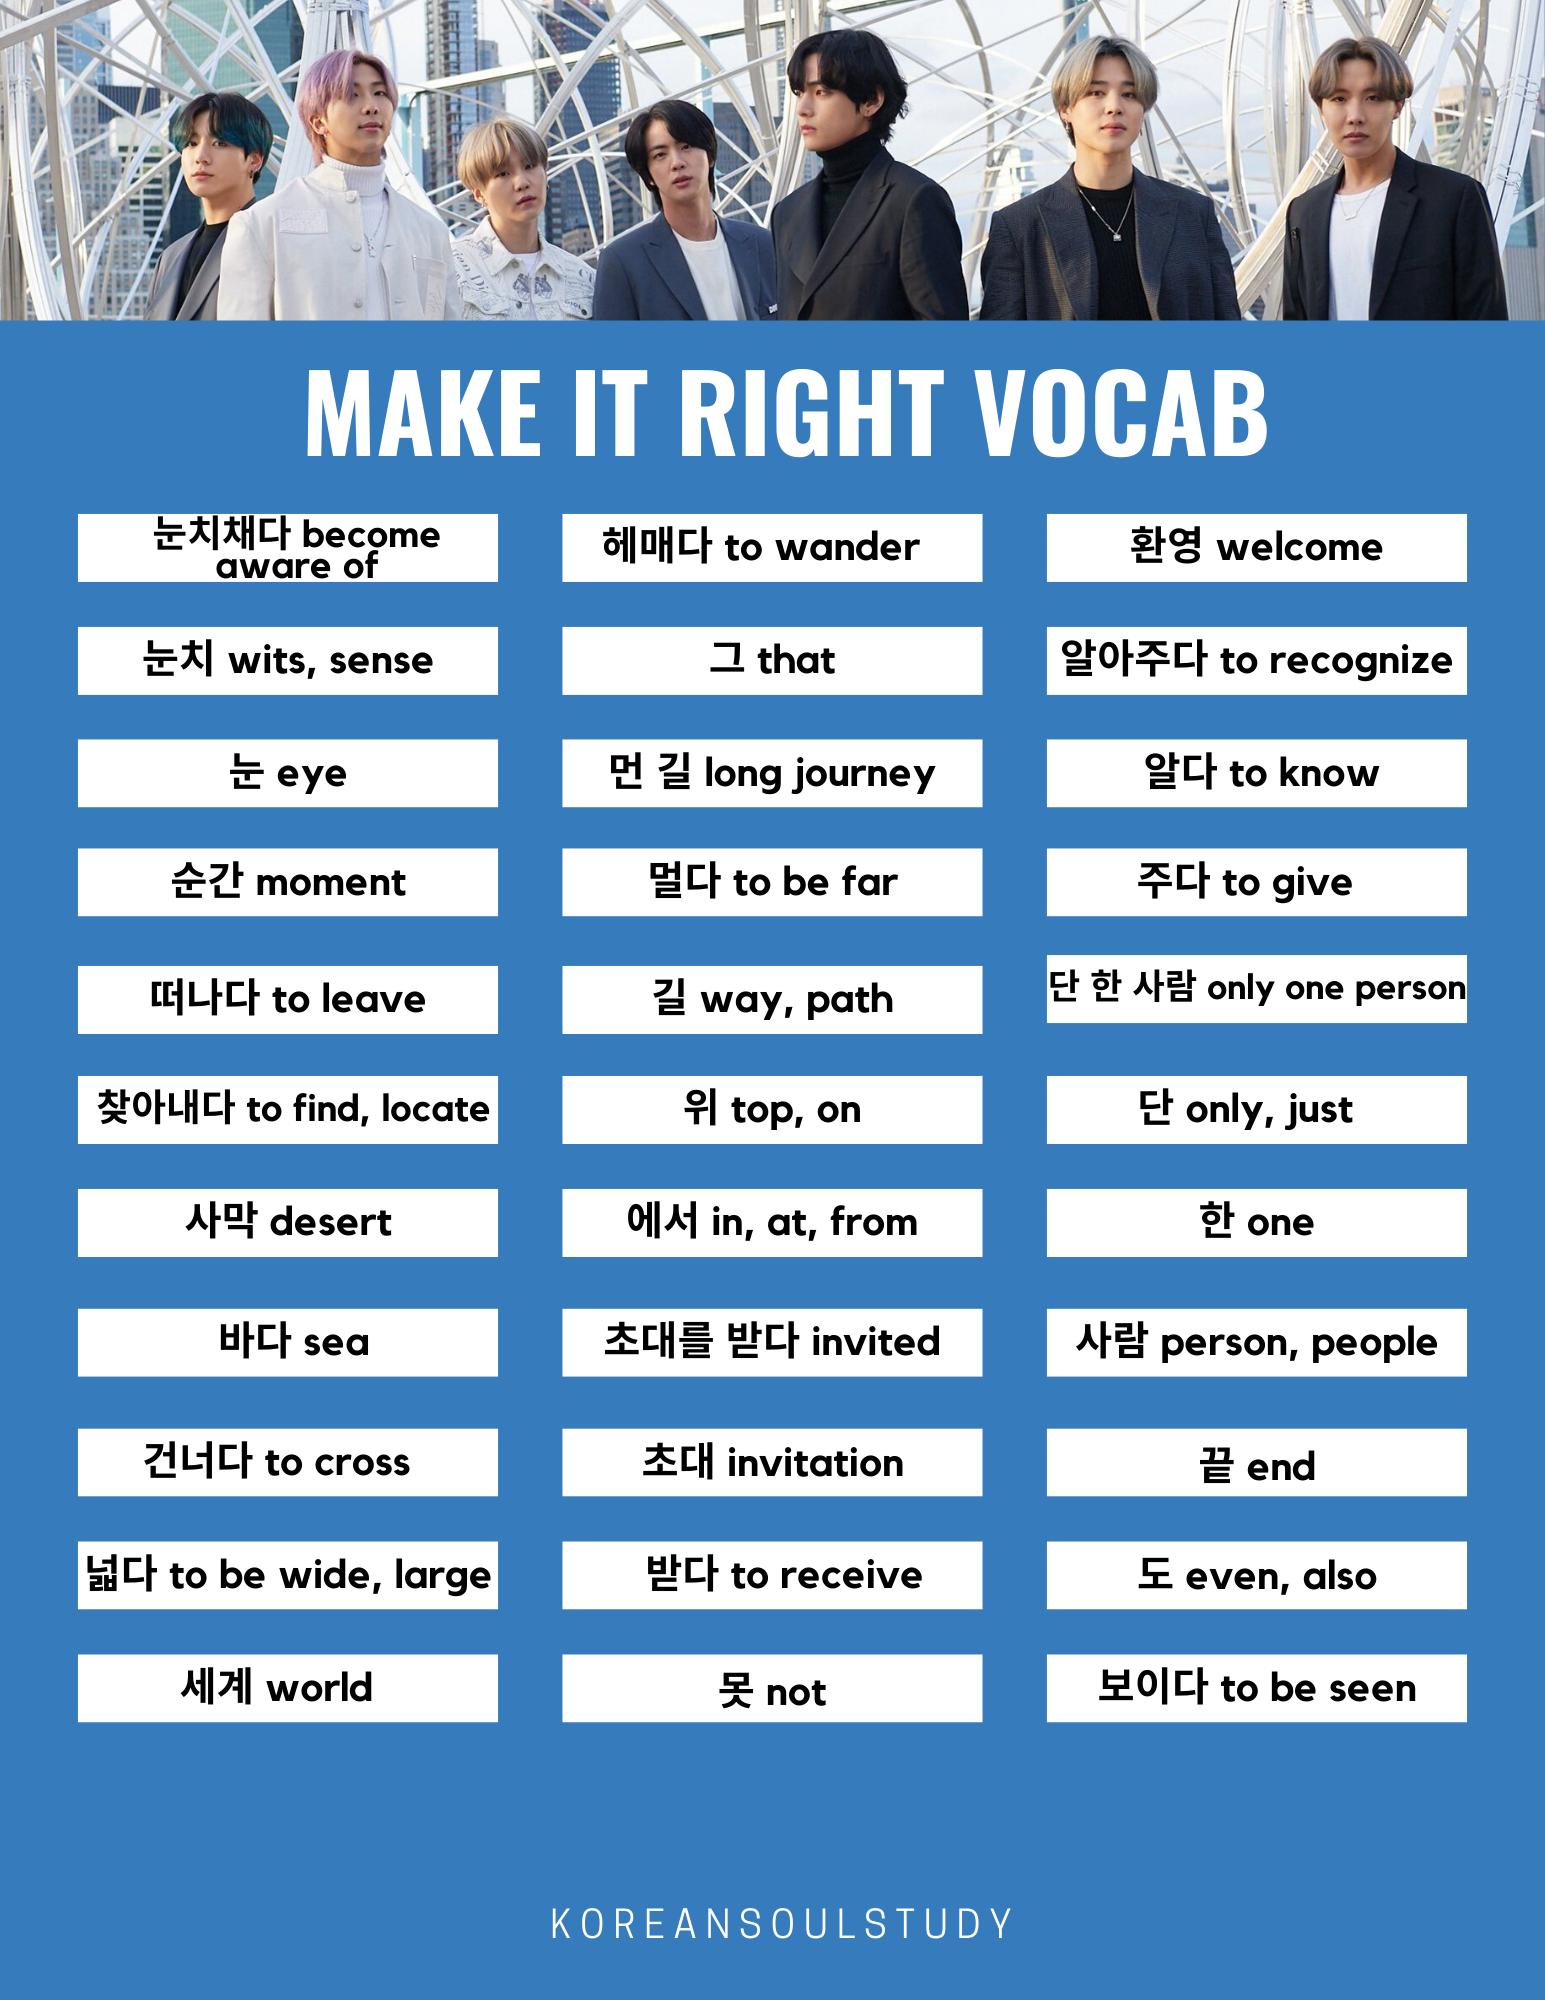 Bts Mots7 Make It Right Lyric Vocab Learn Korea Learn Korean Korean Lessons